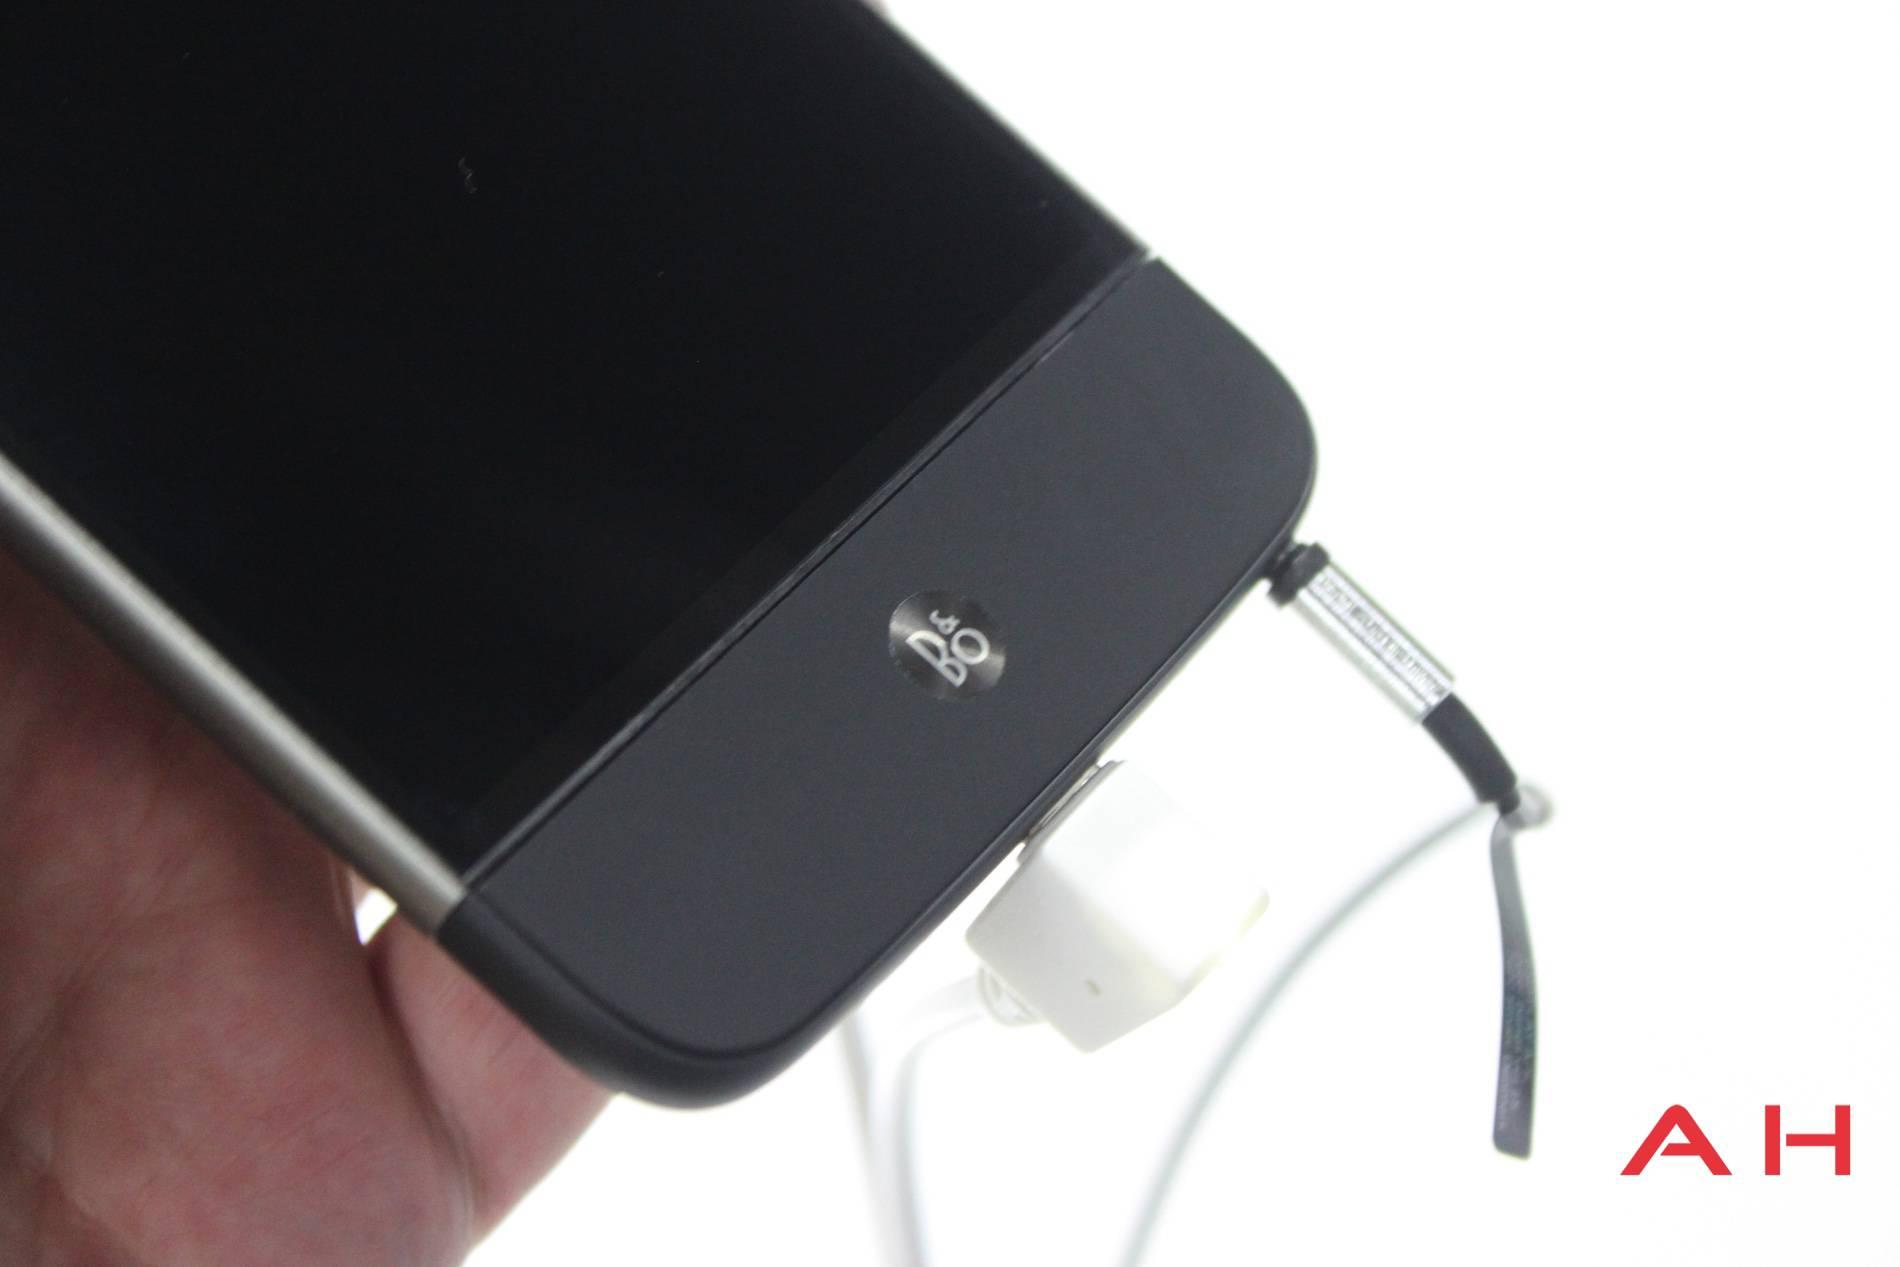 LG G5 BO HiFi Plus AH 04